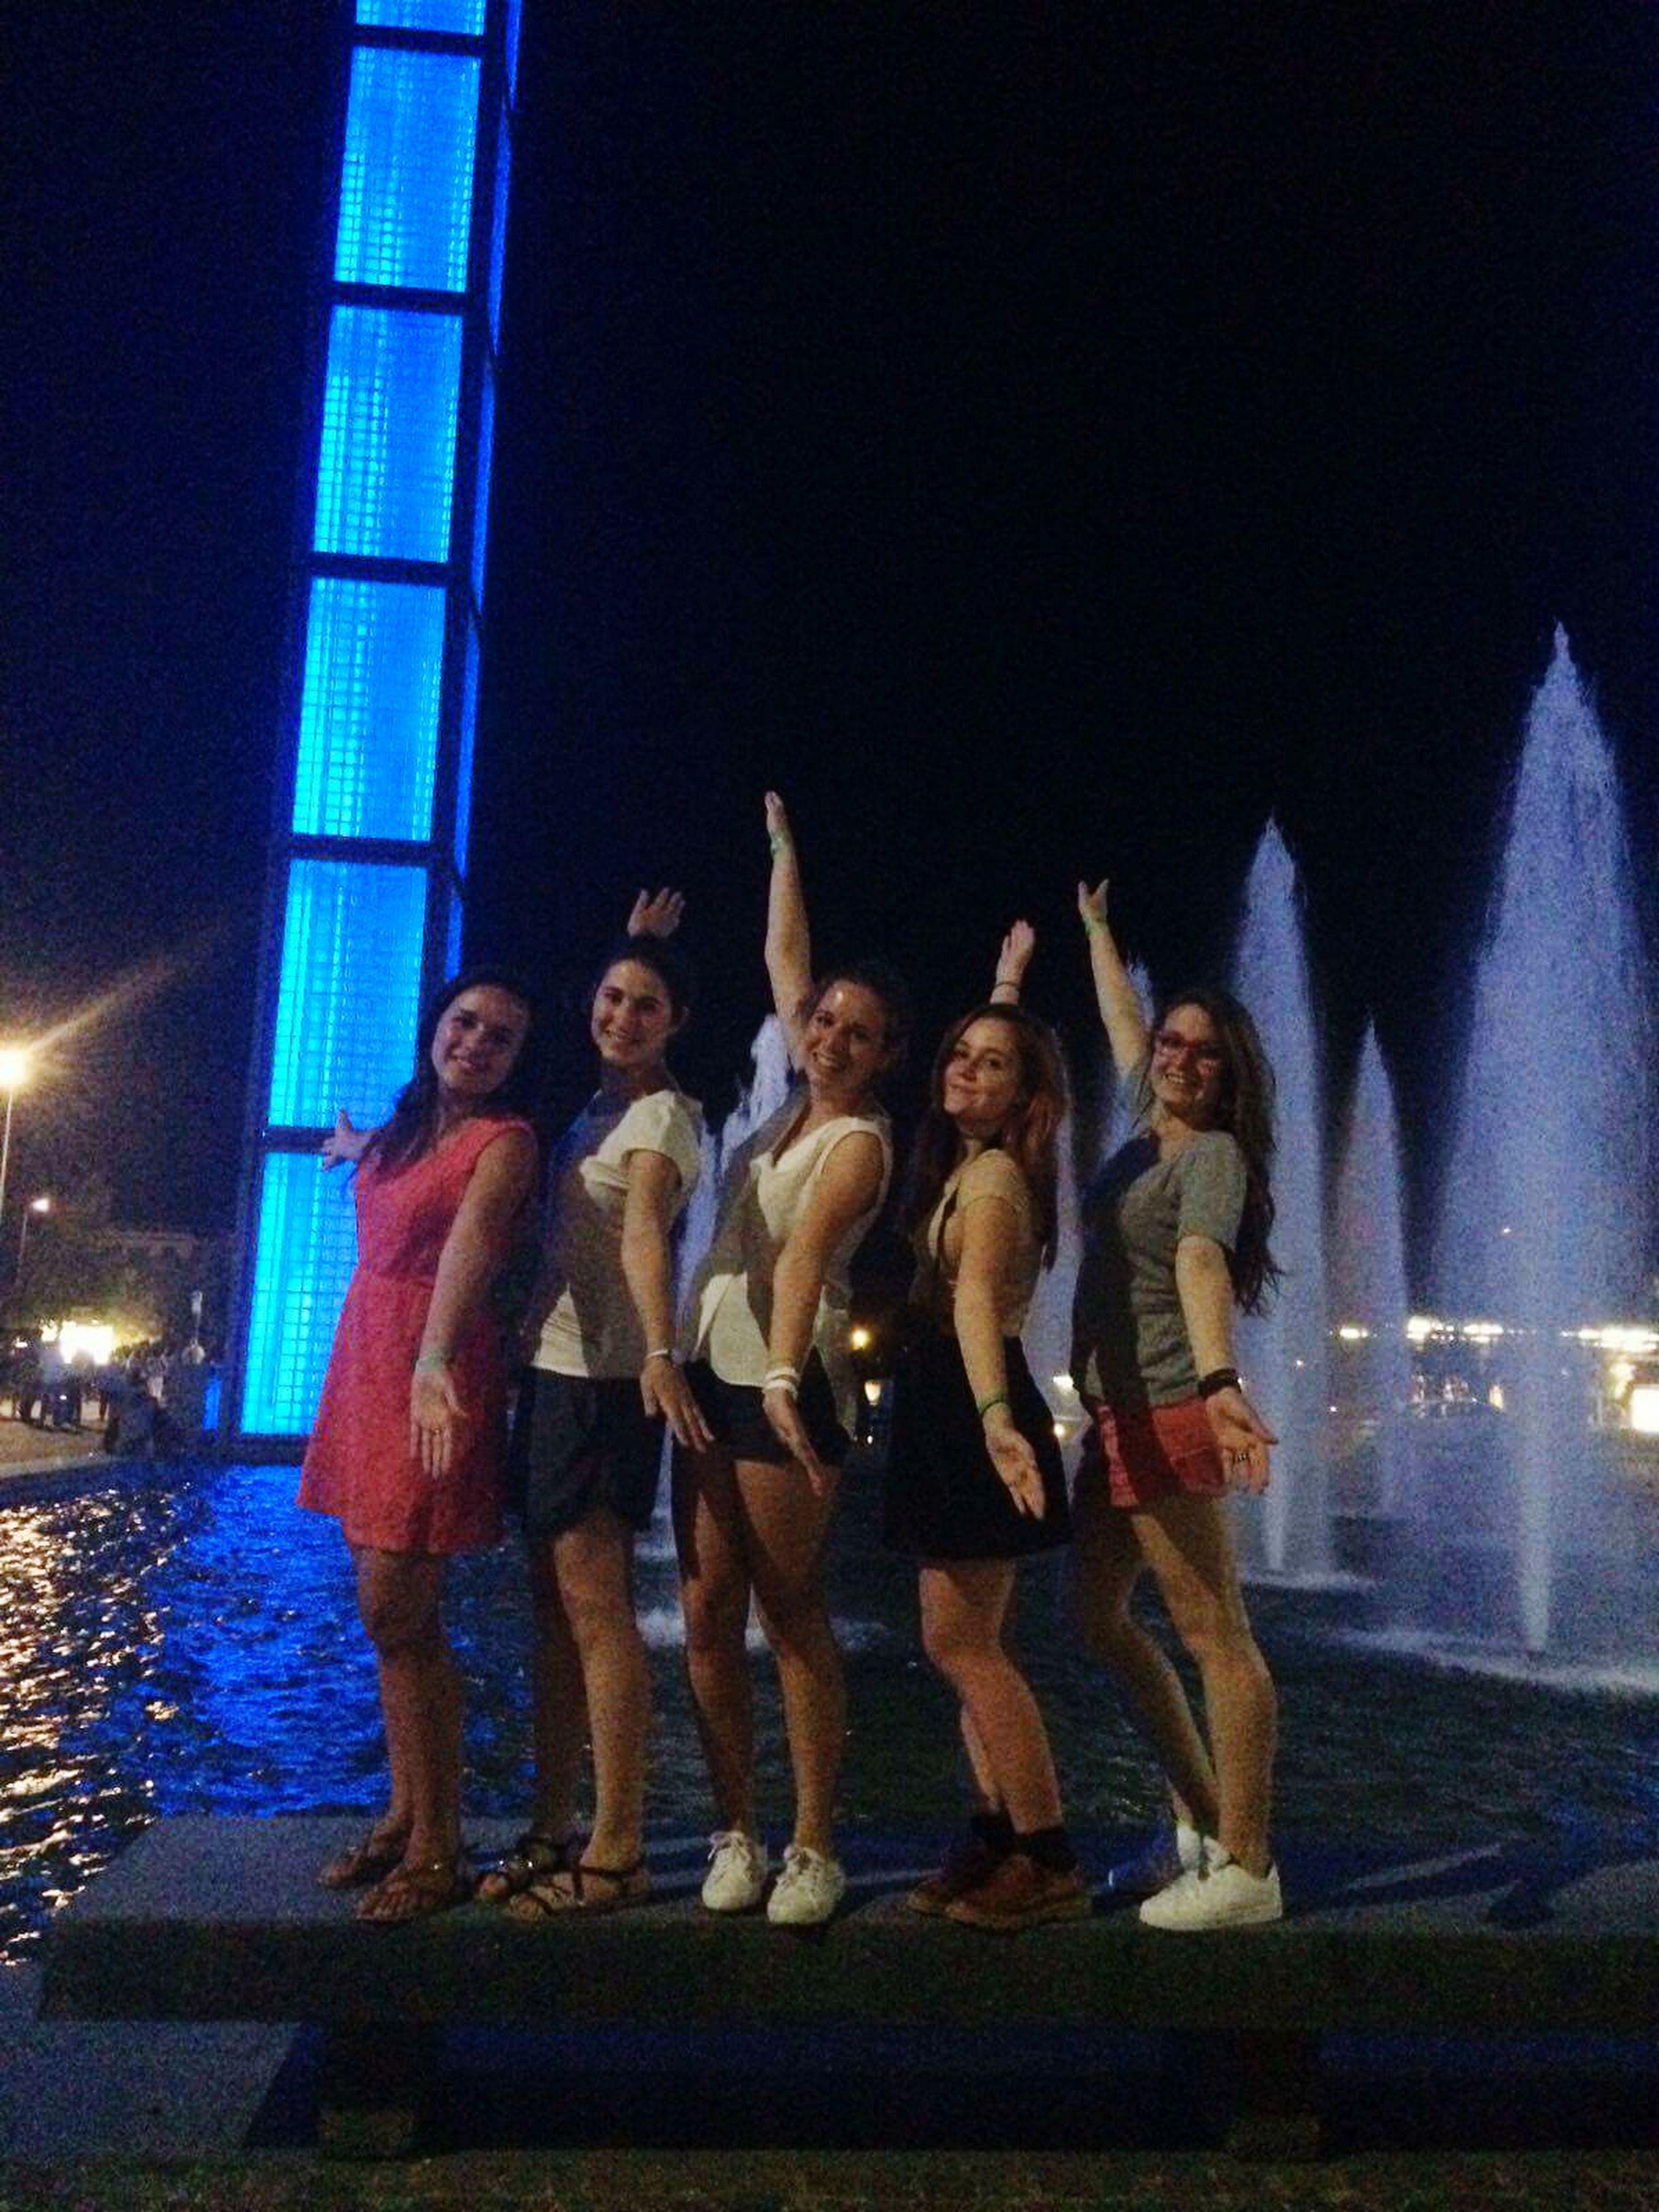 night, illuminated, togetherness, celebration, dancing, full length, outdoors, performance